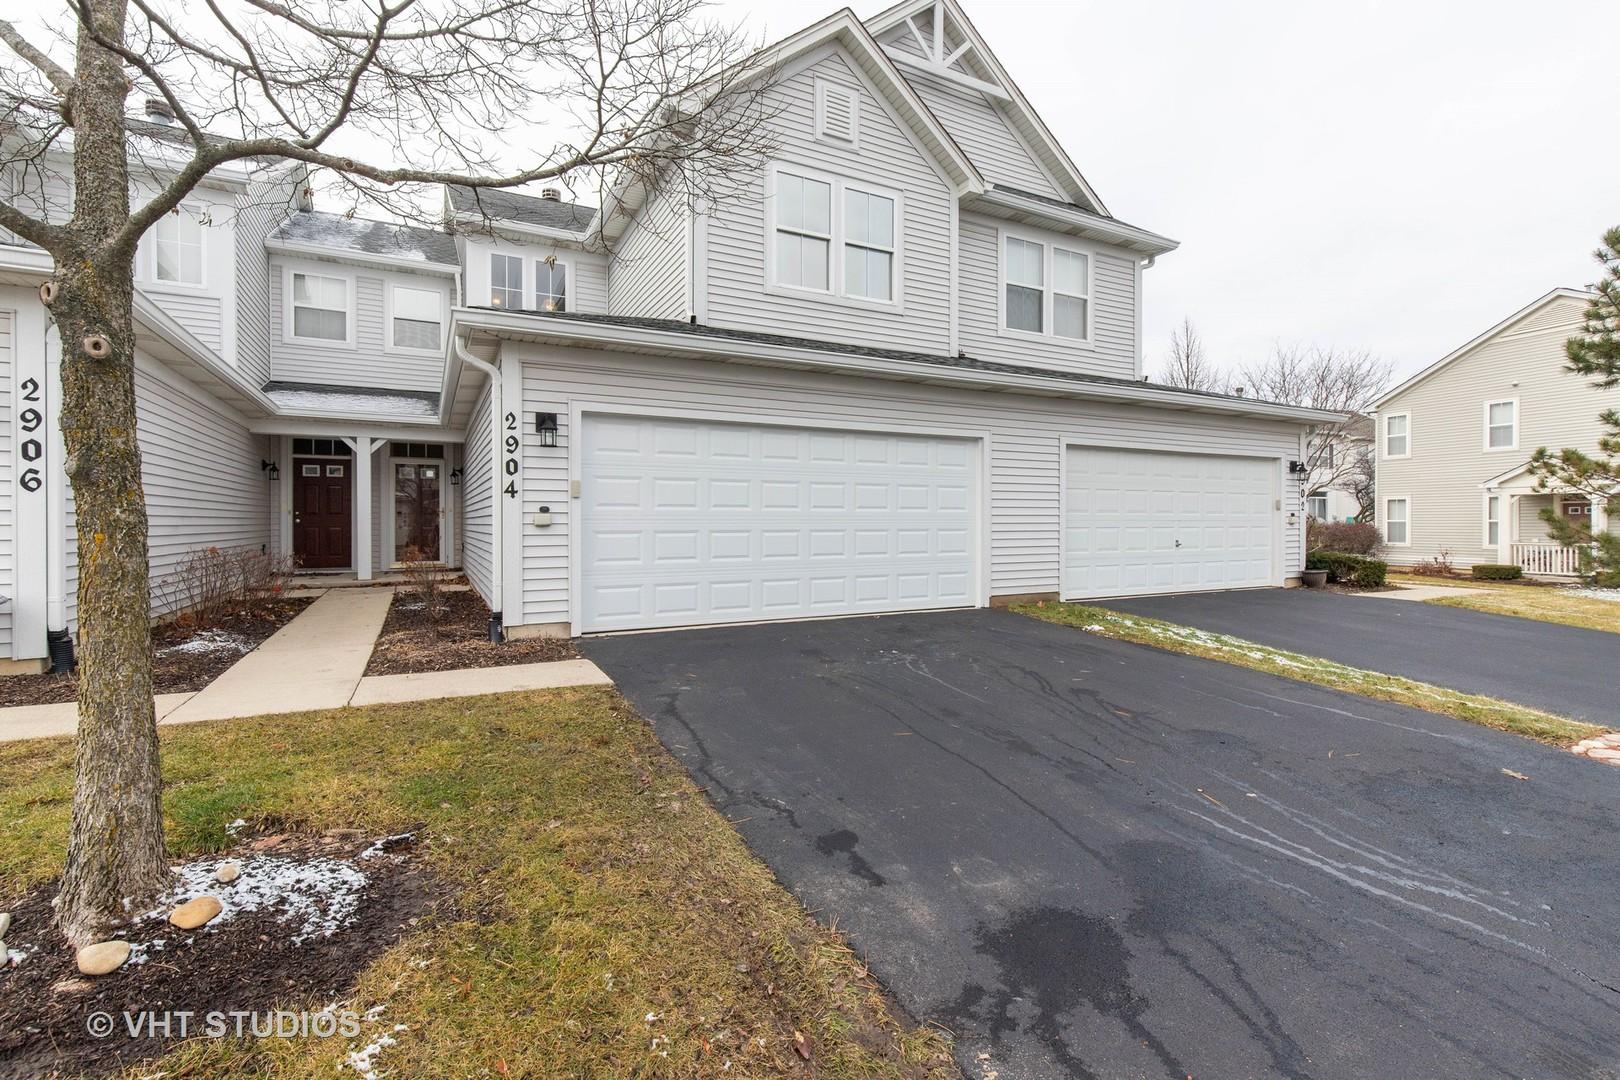 2904 Falling Waters Drive, Unit 2904, Lindenhurst, Illinois 60046